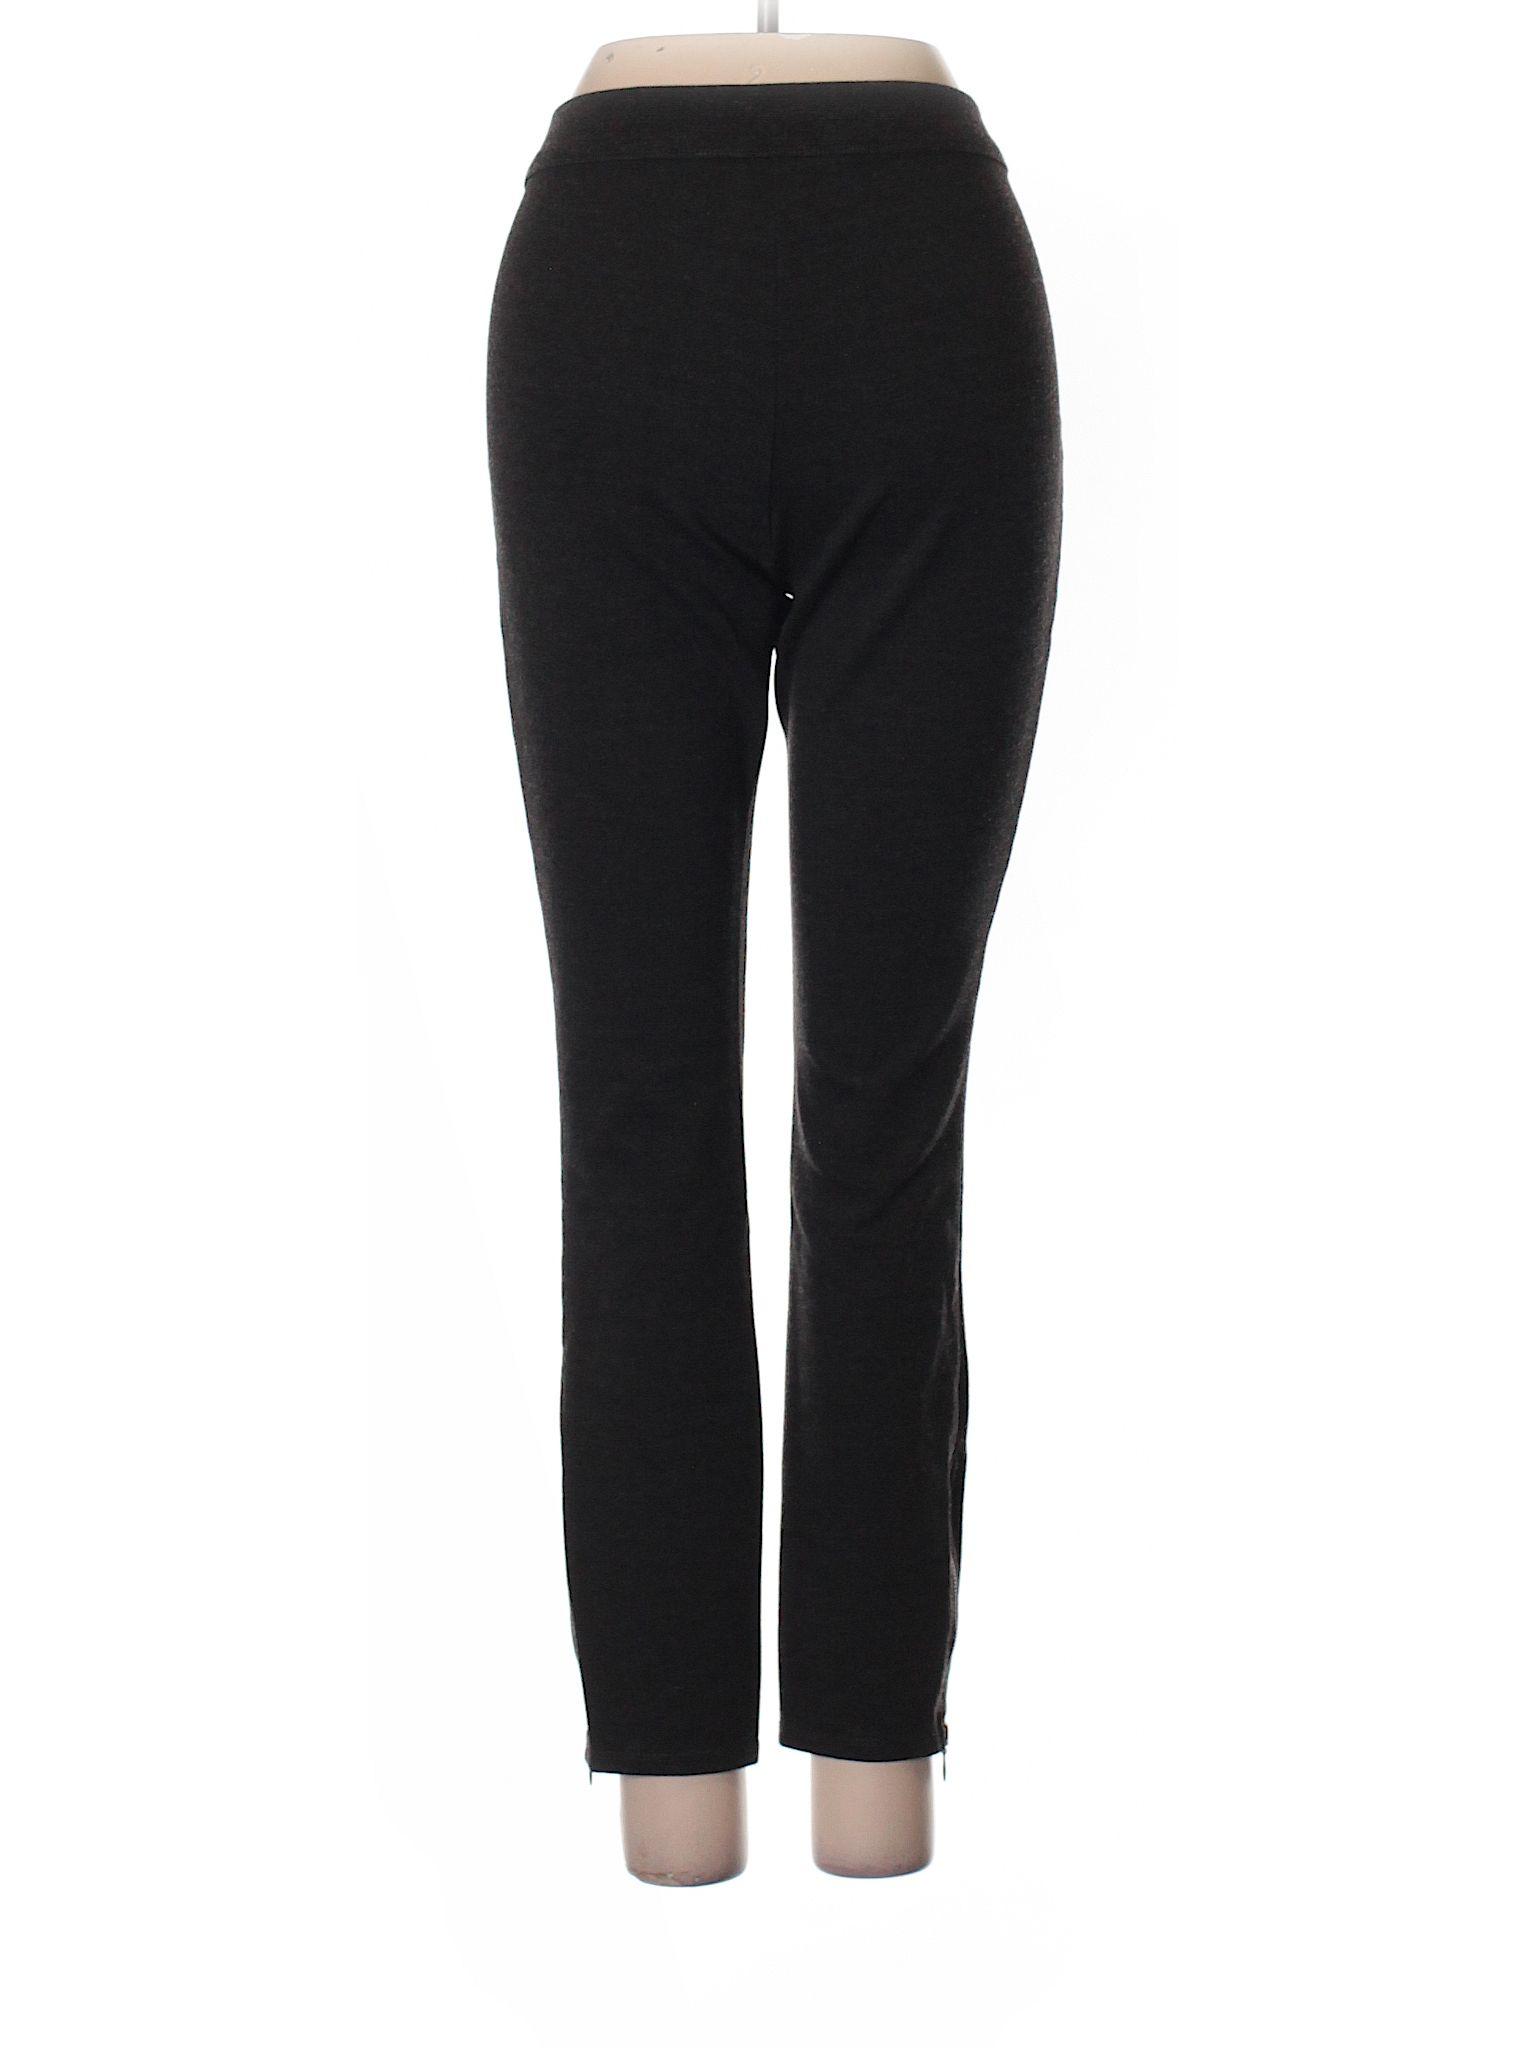 3912d66a62013 Max Studio Leggings: Gray Women's Bottoms - 27923329